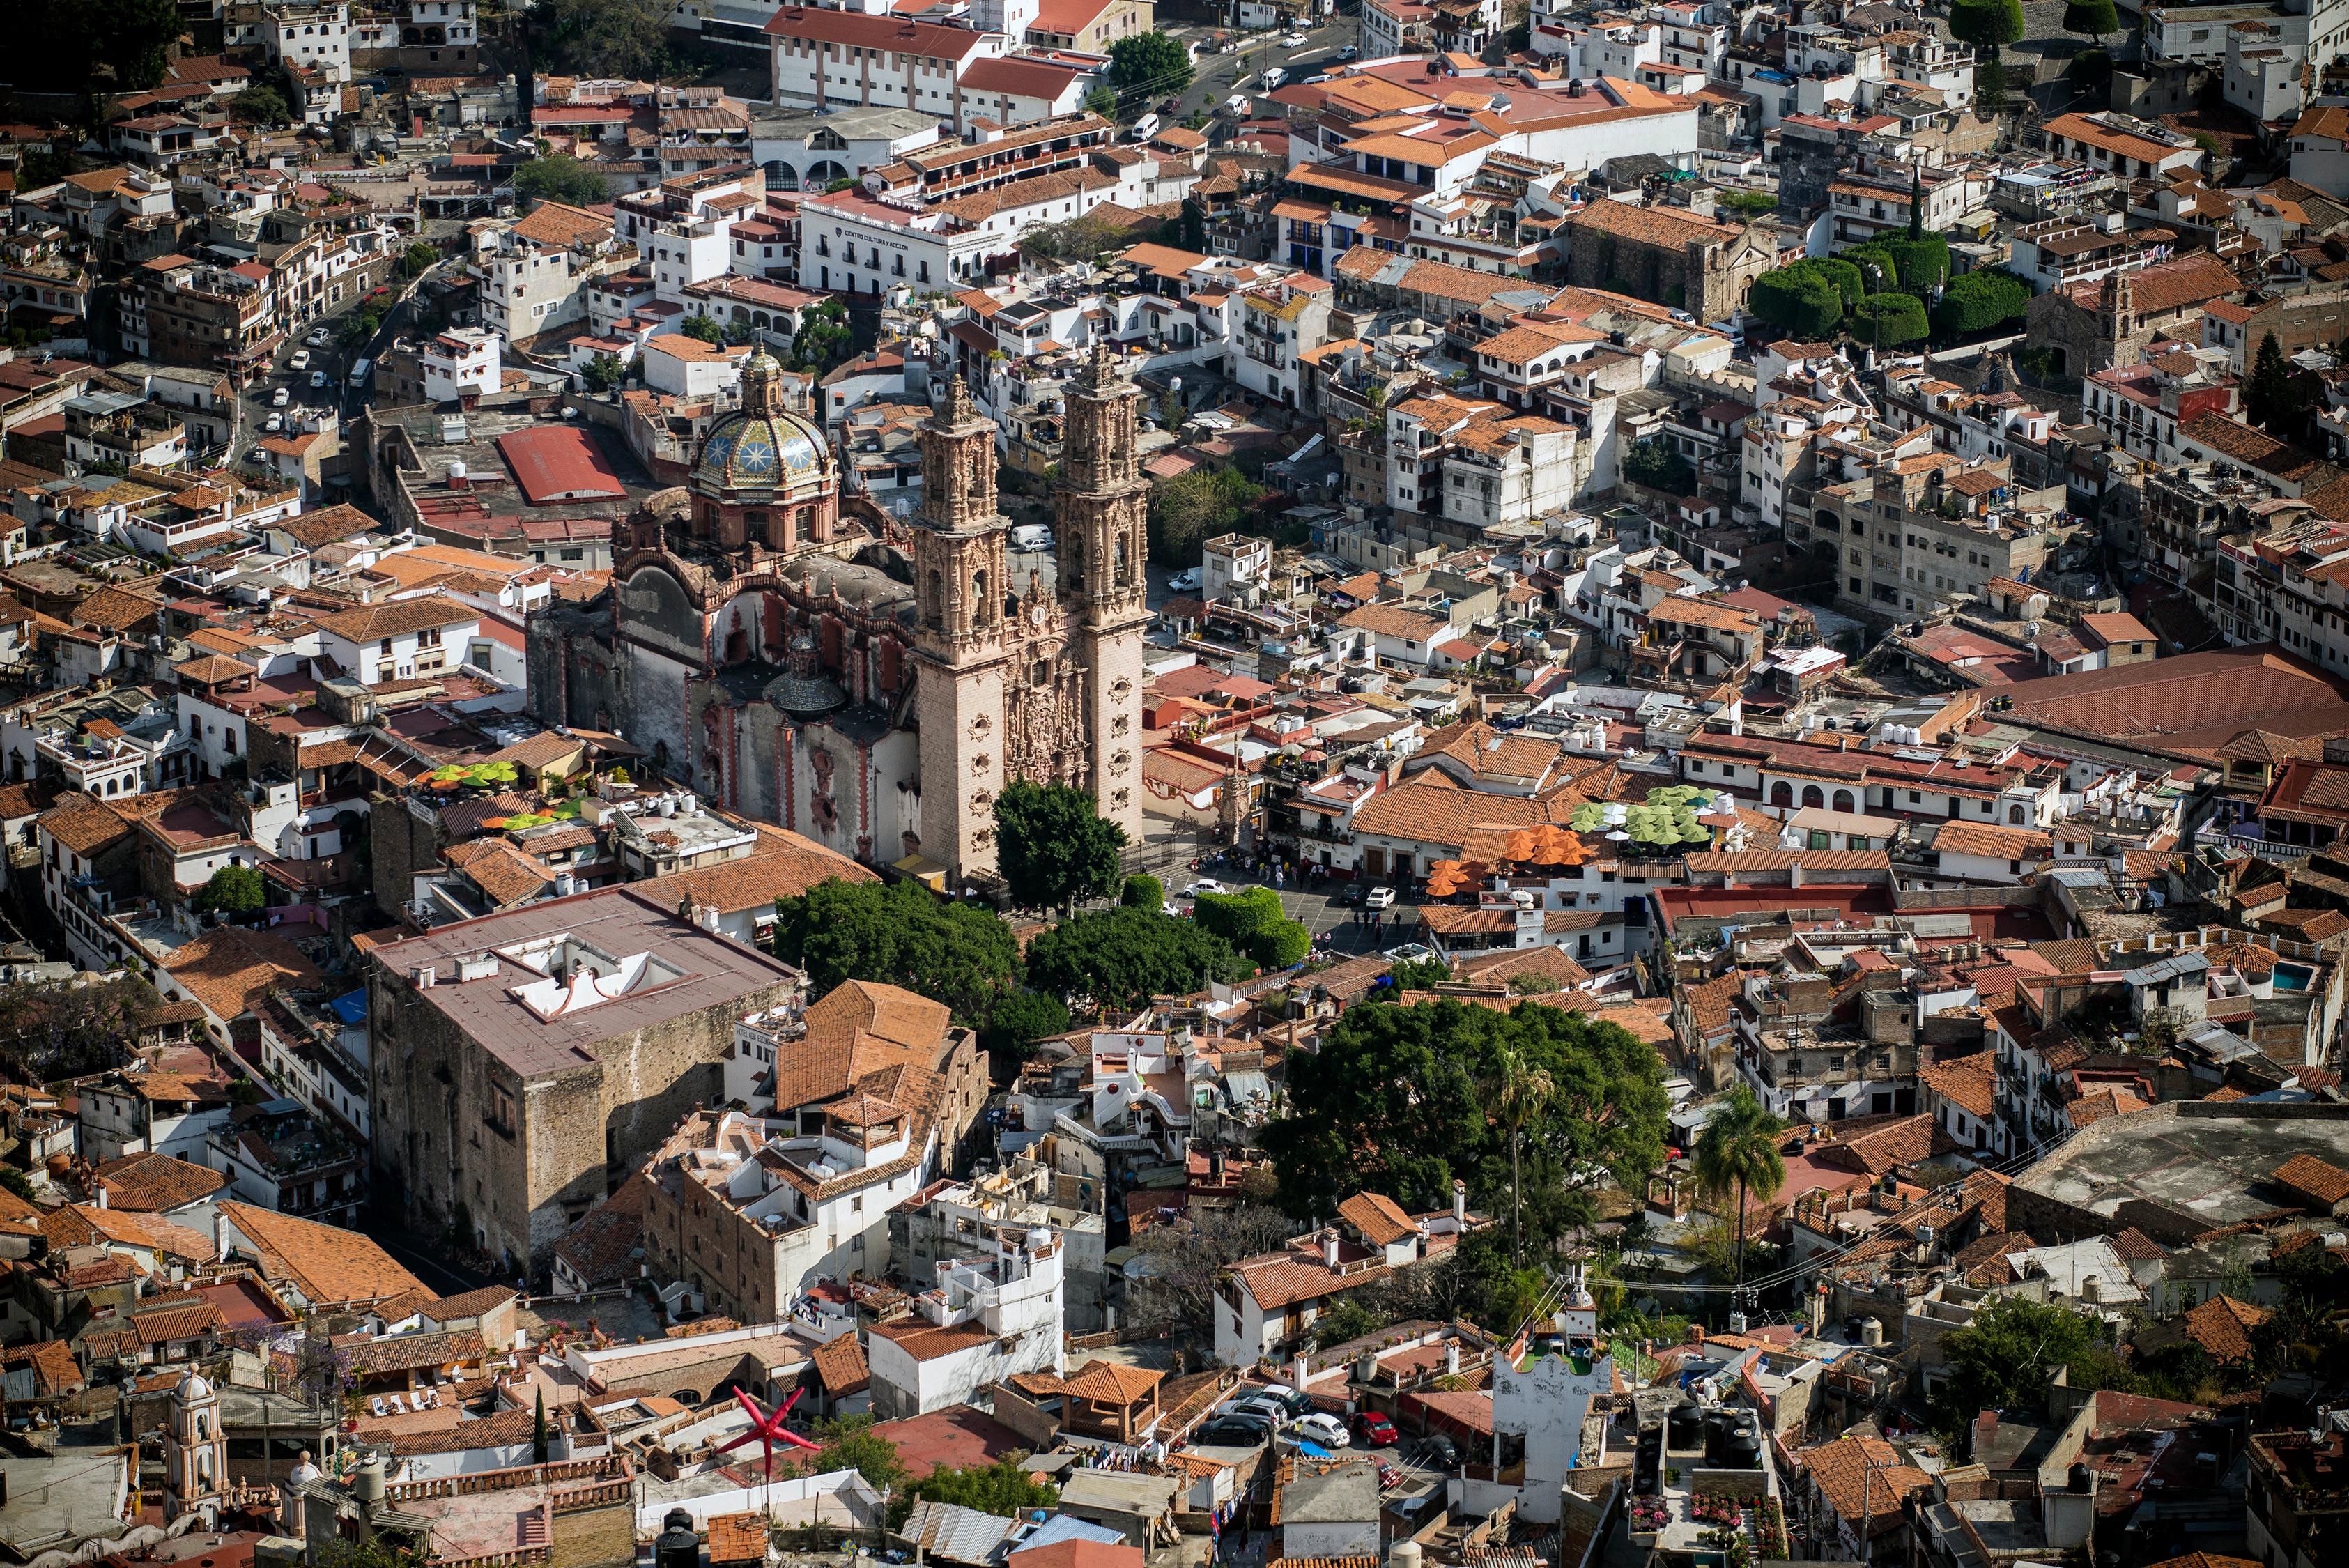 Town City Cityscape Suburb Bird View Drone Earthquake Slum Metropolis Neighbourhood Birds Eye Aerial